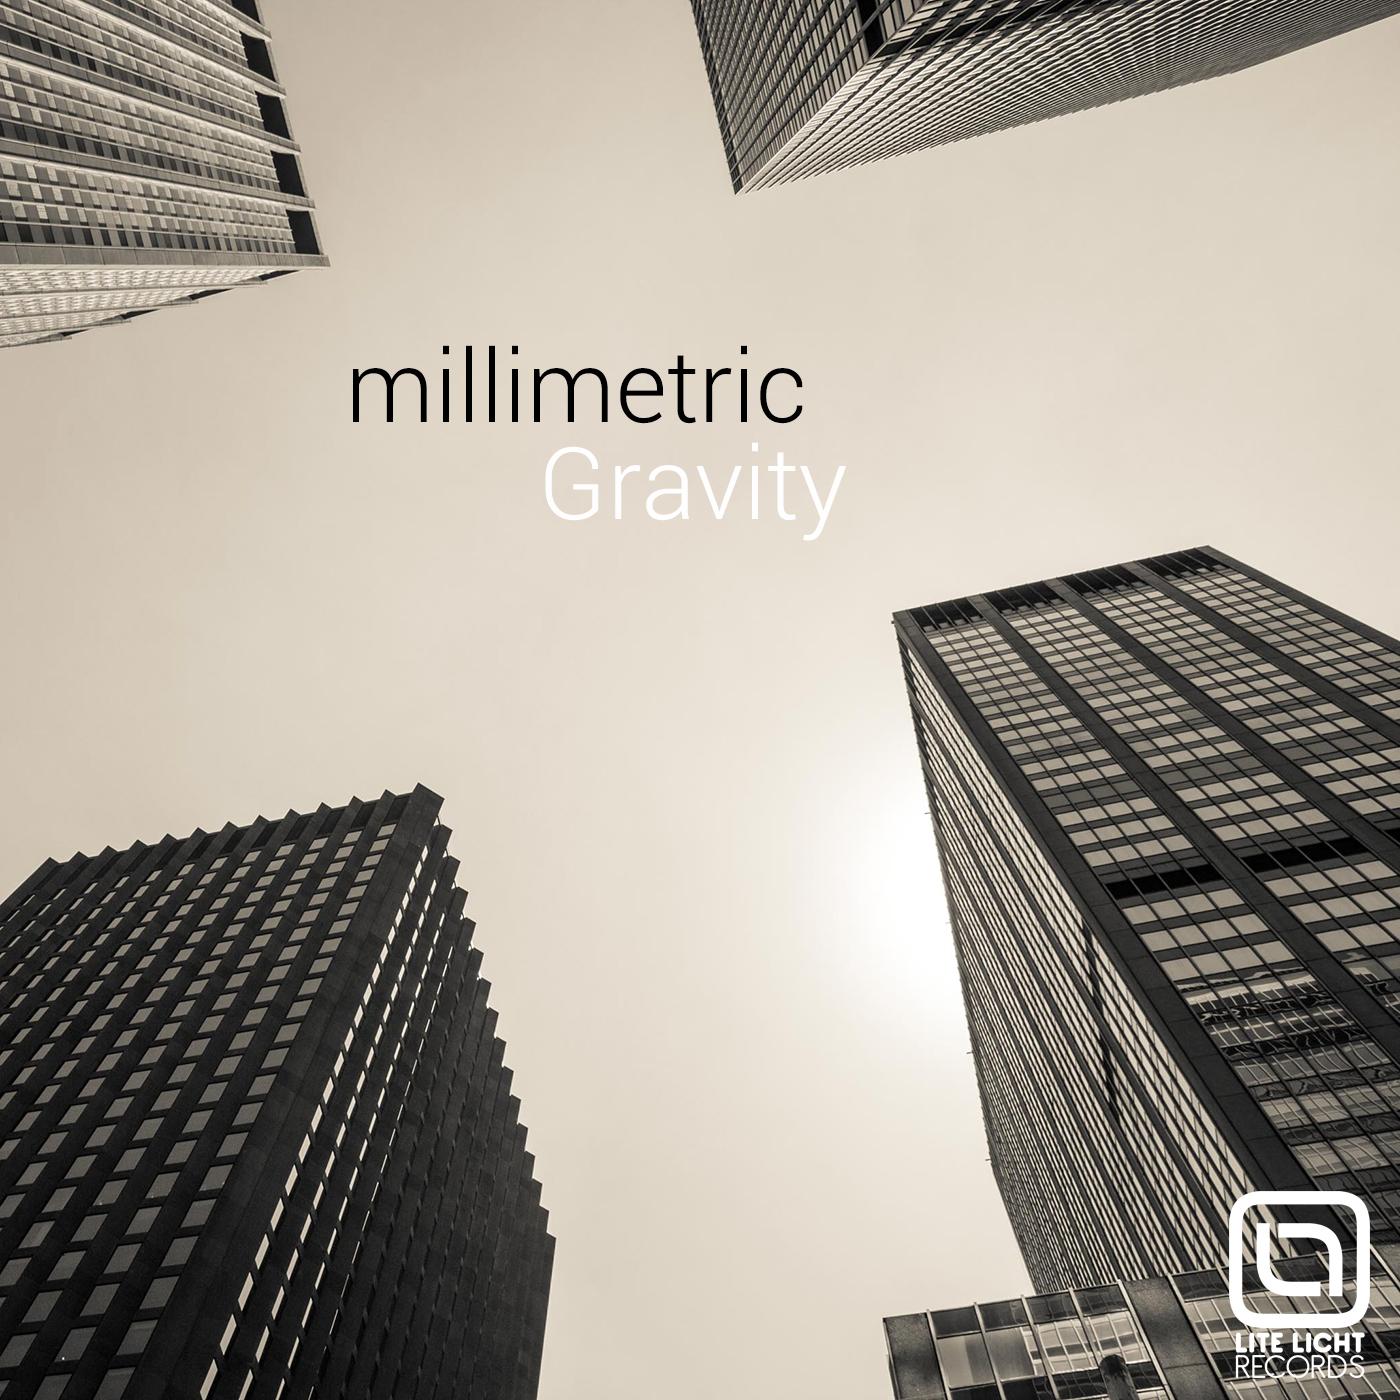 Gravity - millimetric